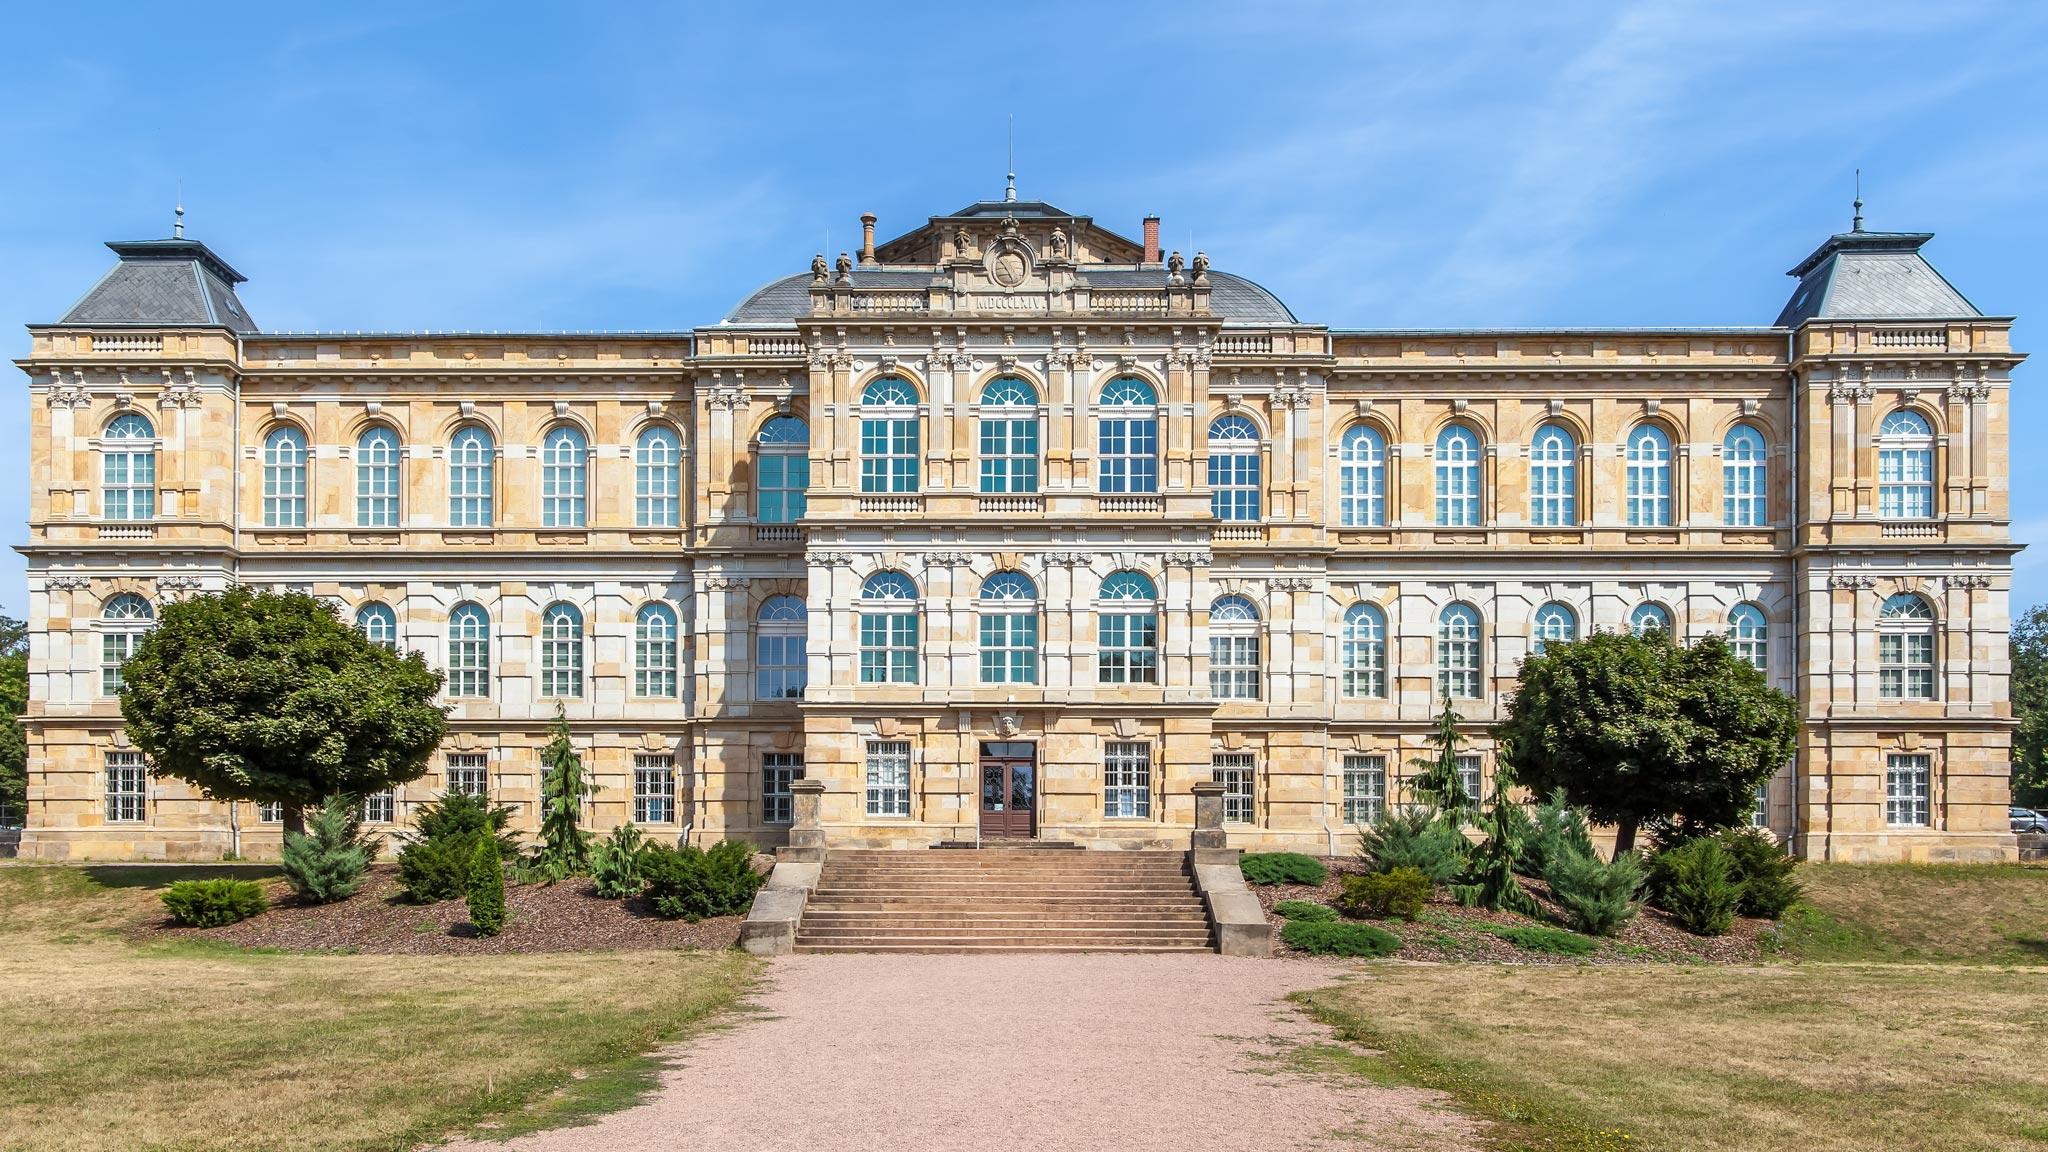 Castle Gotha Thuringia